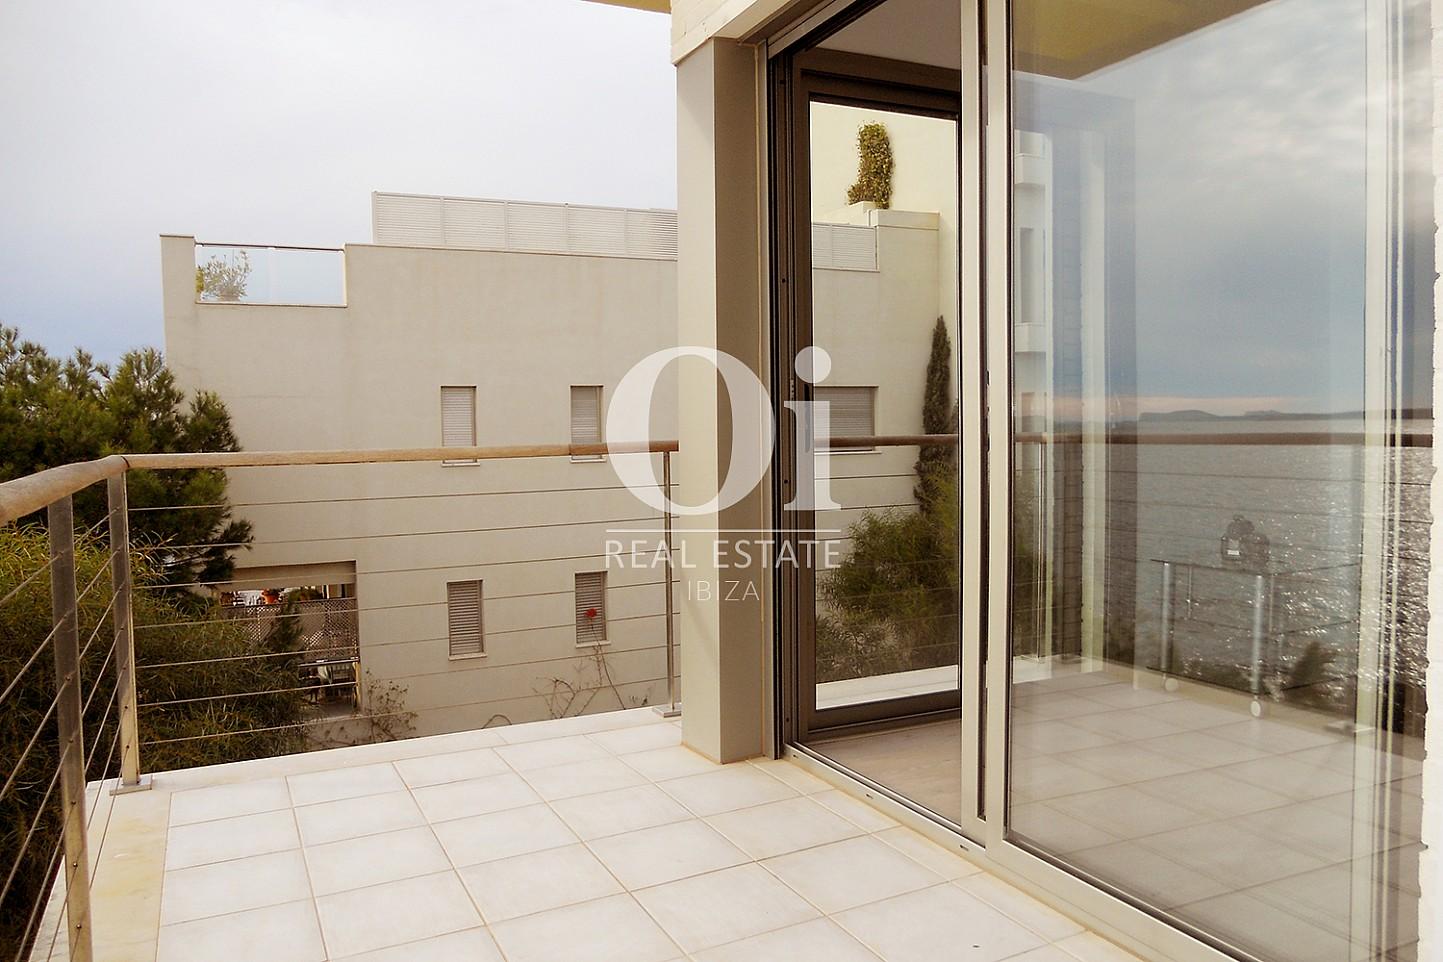 Terraza de piso en venta en Cala Gració, zona de Sant Antoni, Ibiza